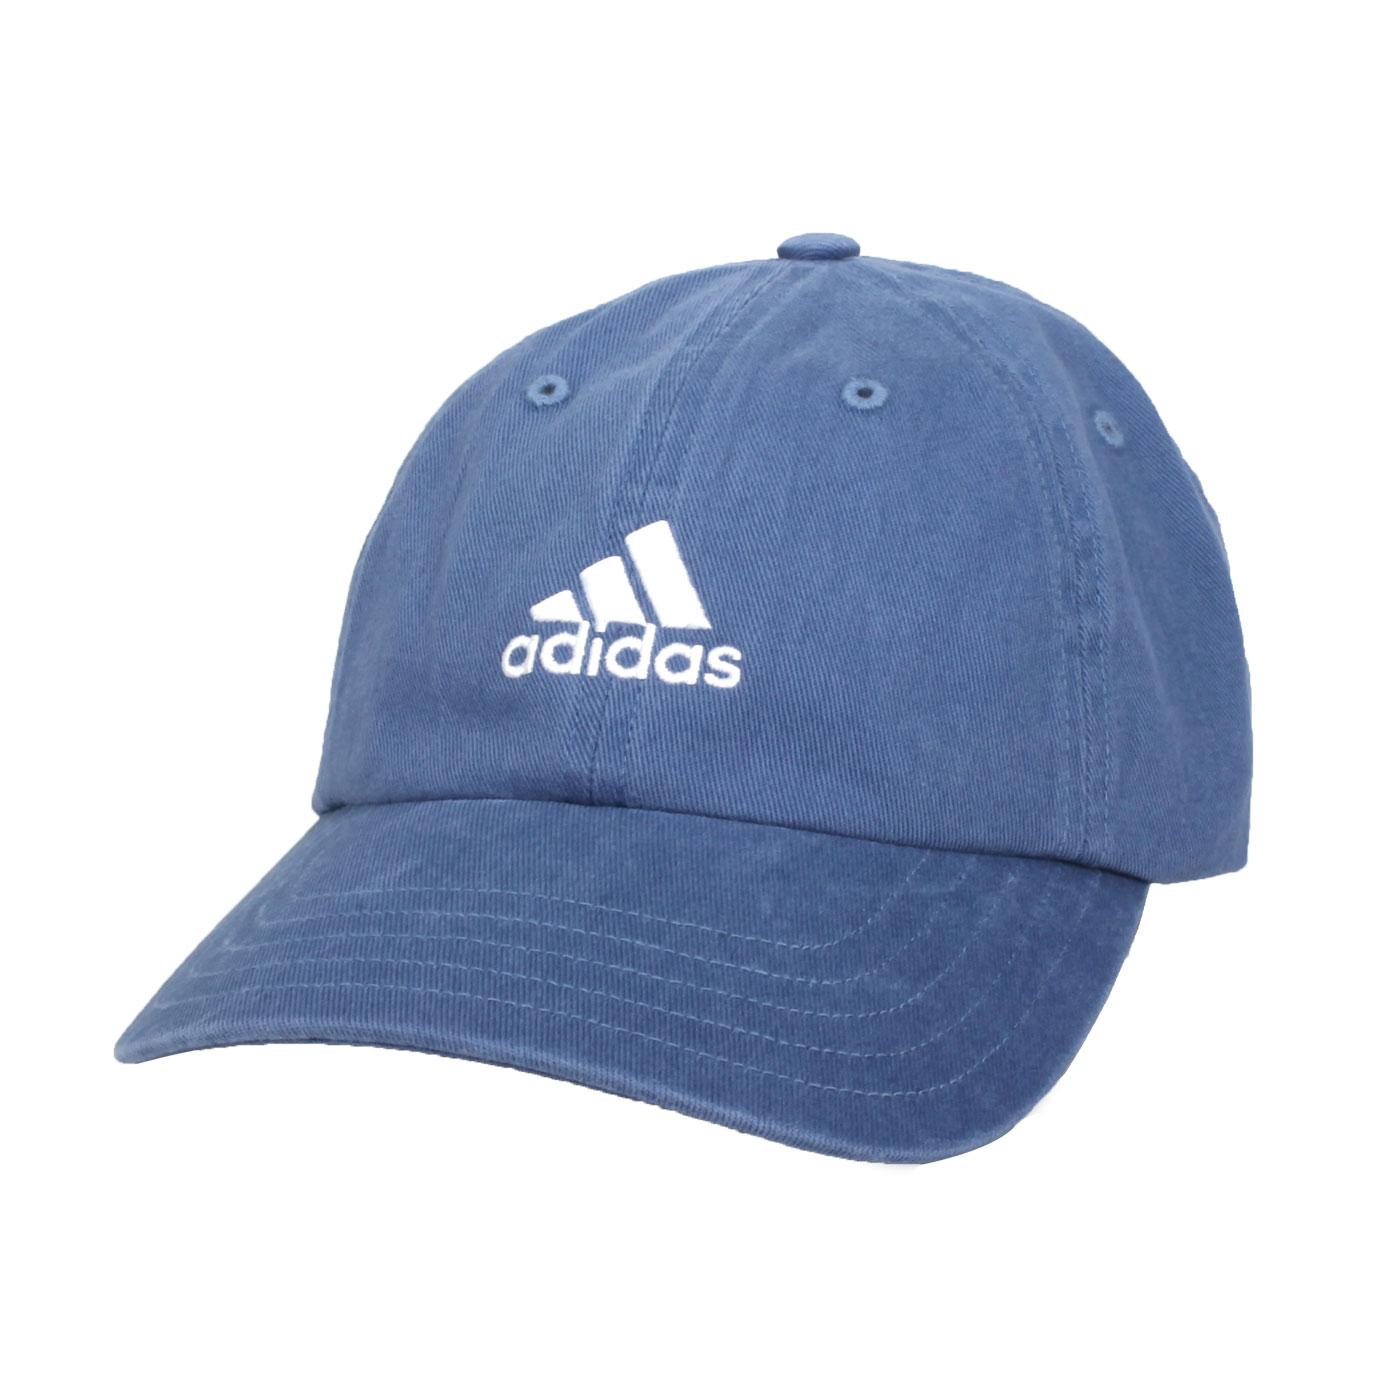 ADIDAS 帽子 GM6281 - 藍白